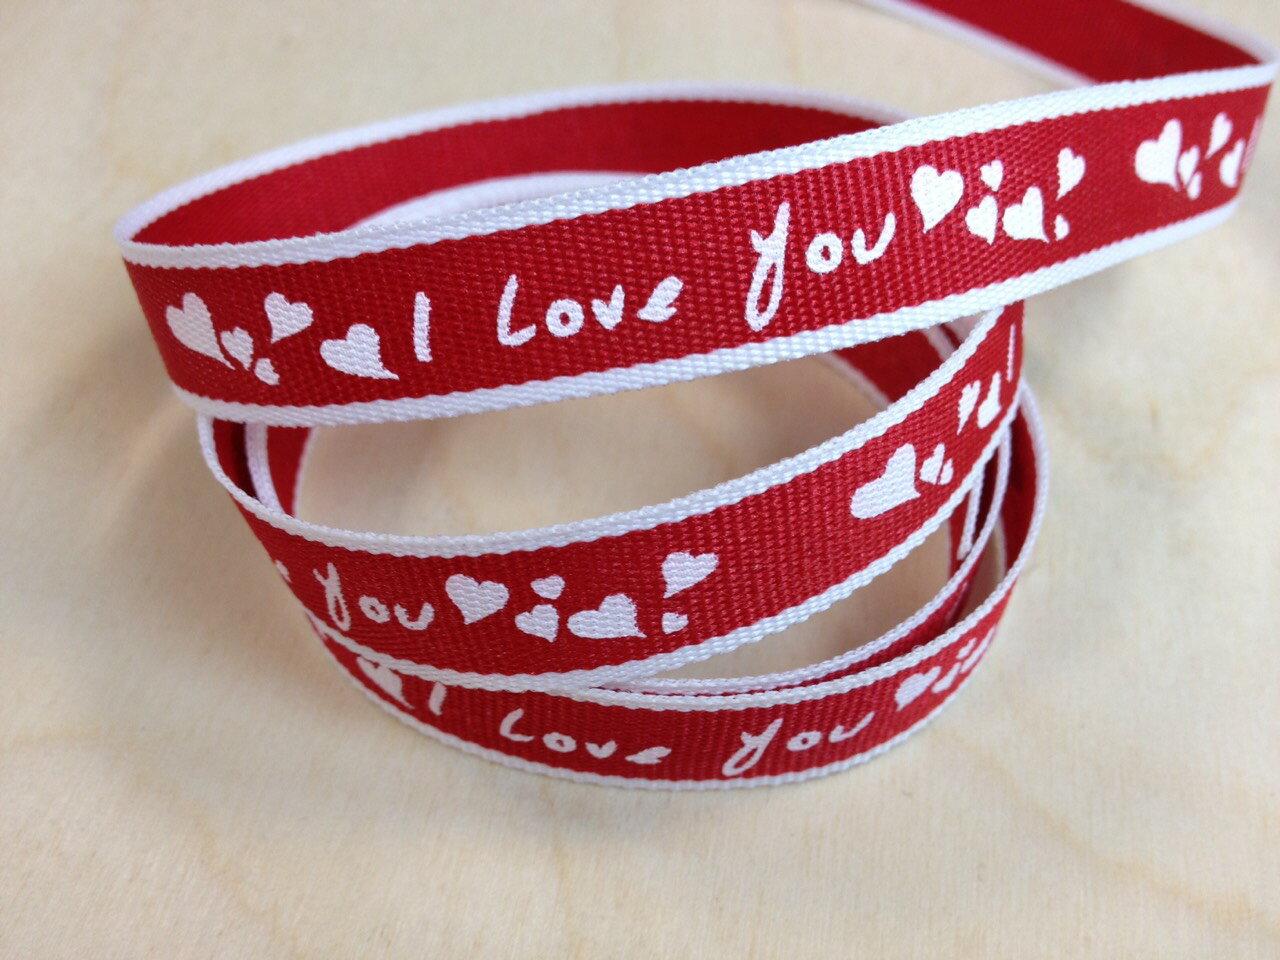 【Crystal Rose緞帶專賣店】love 愛心緞帶 12mm 3碼 (9色) 5